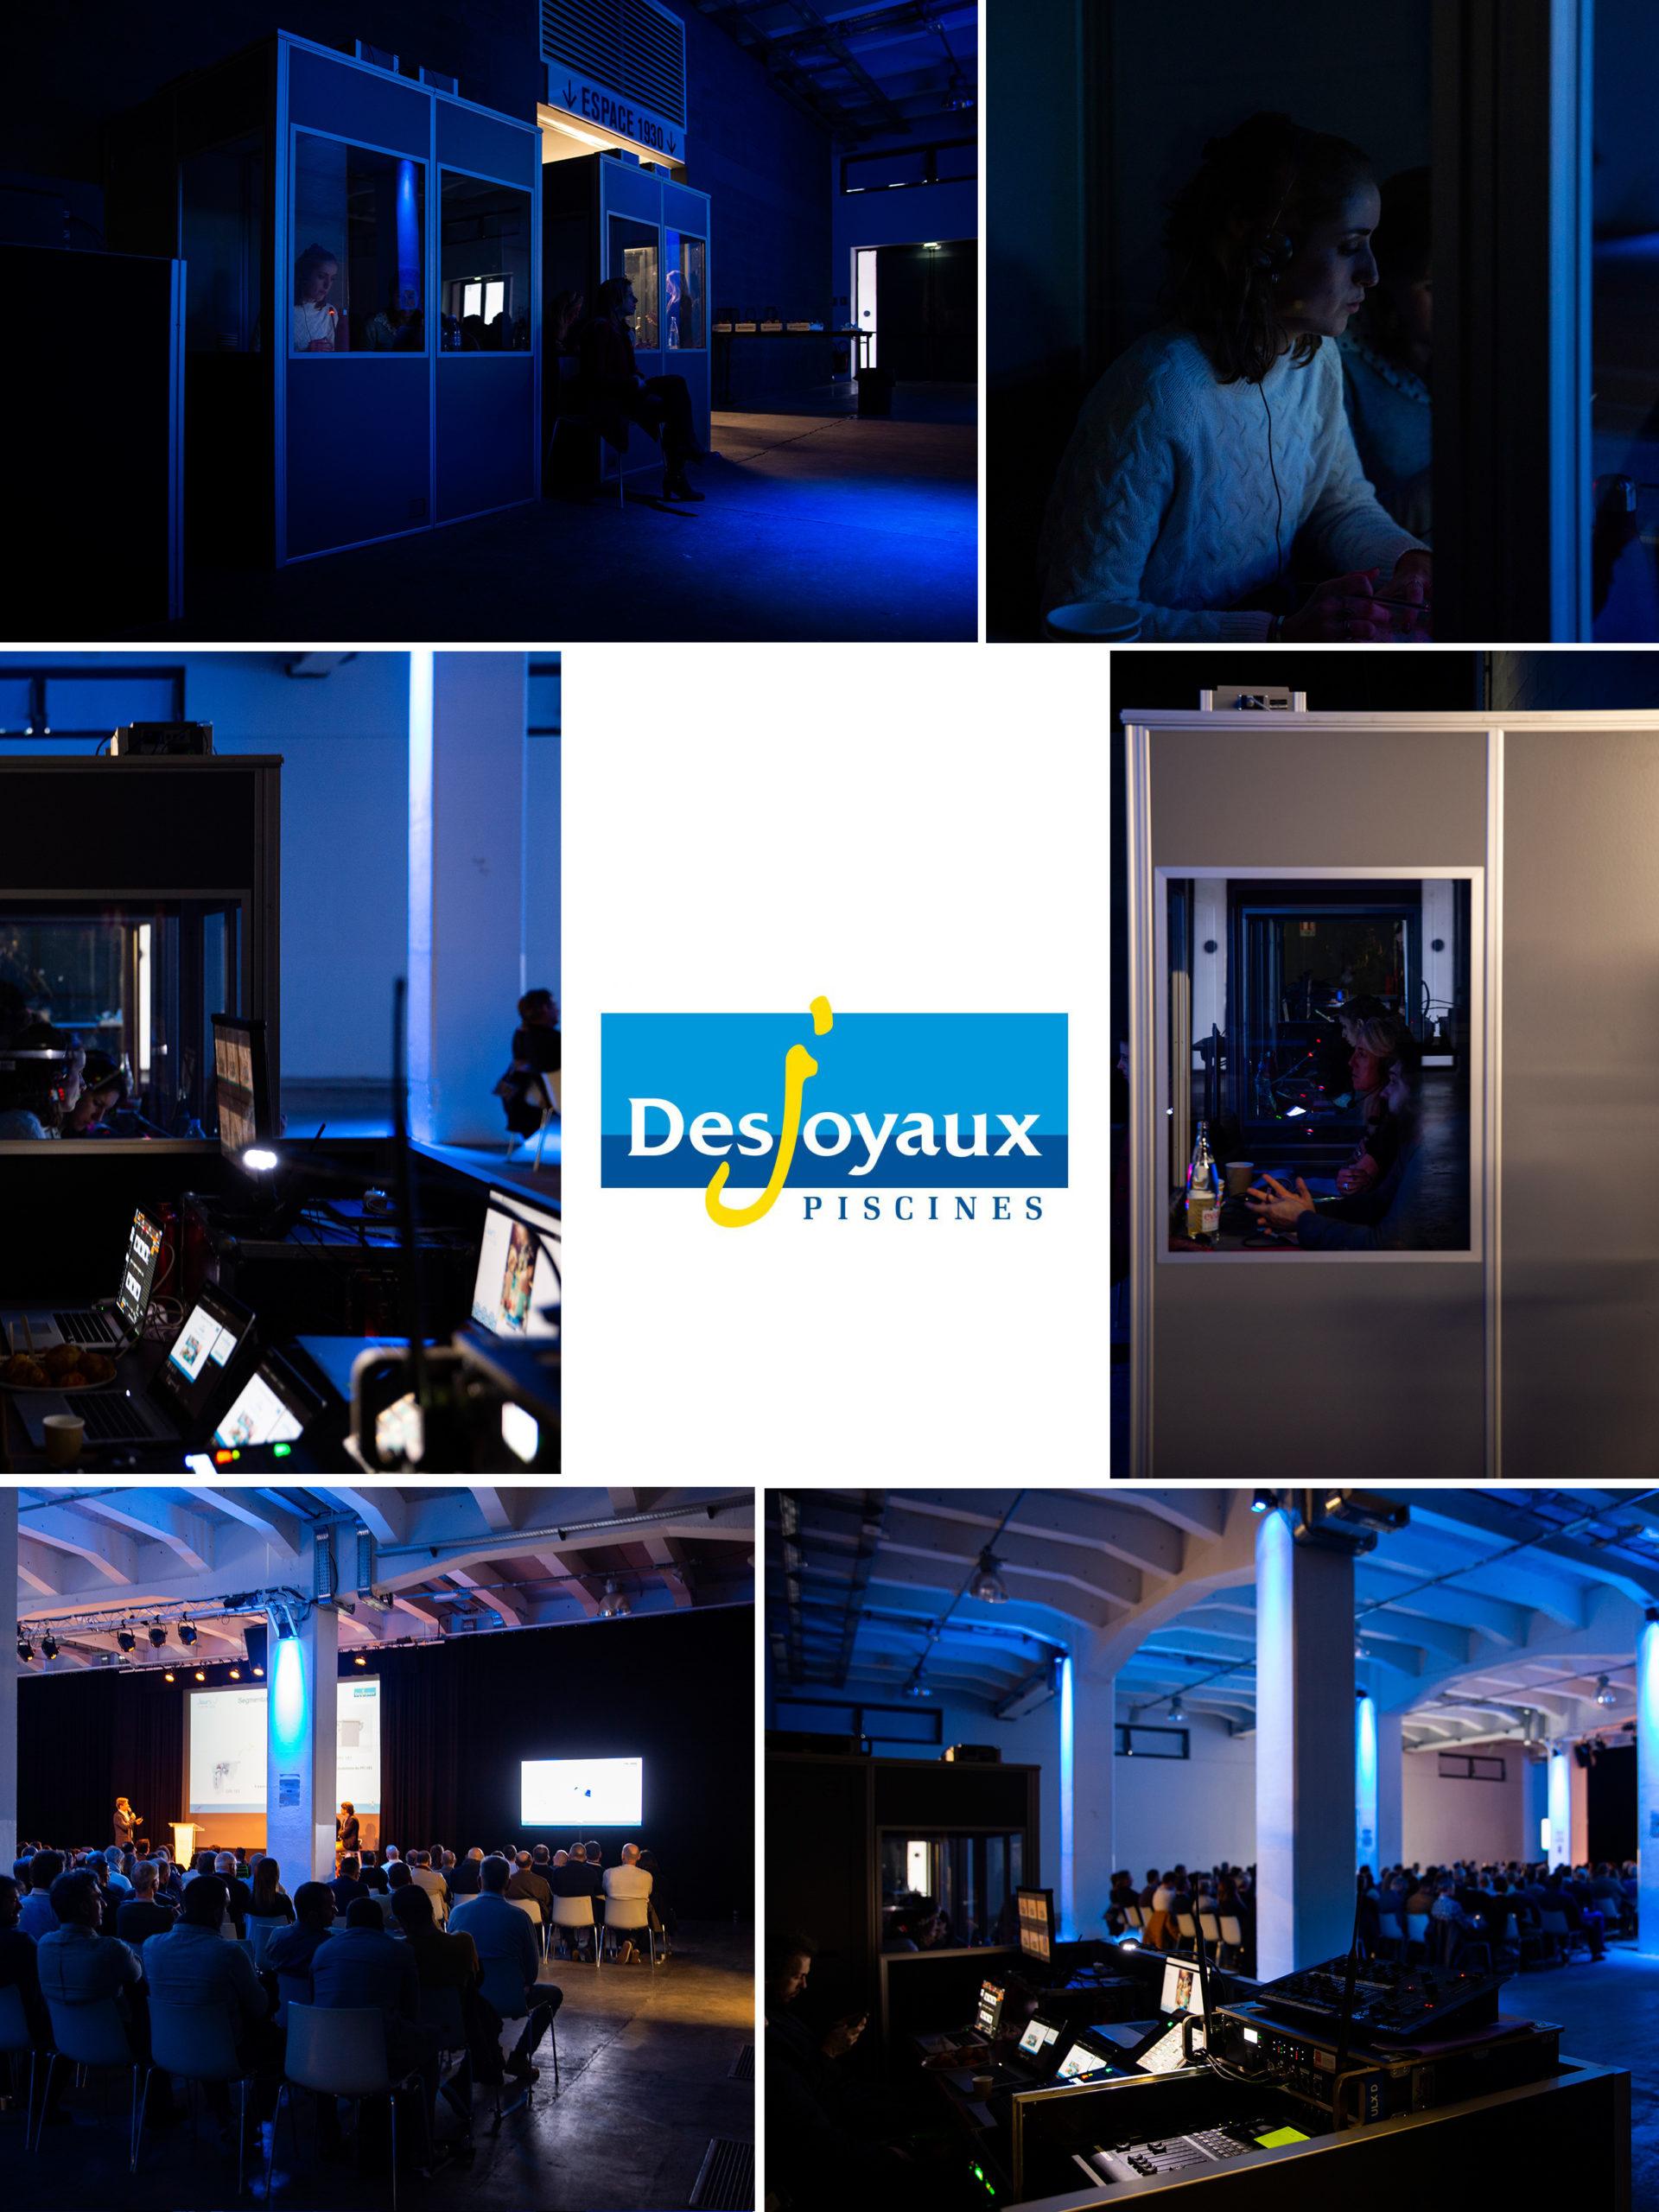 Desjoyaux dives into 2020!